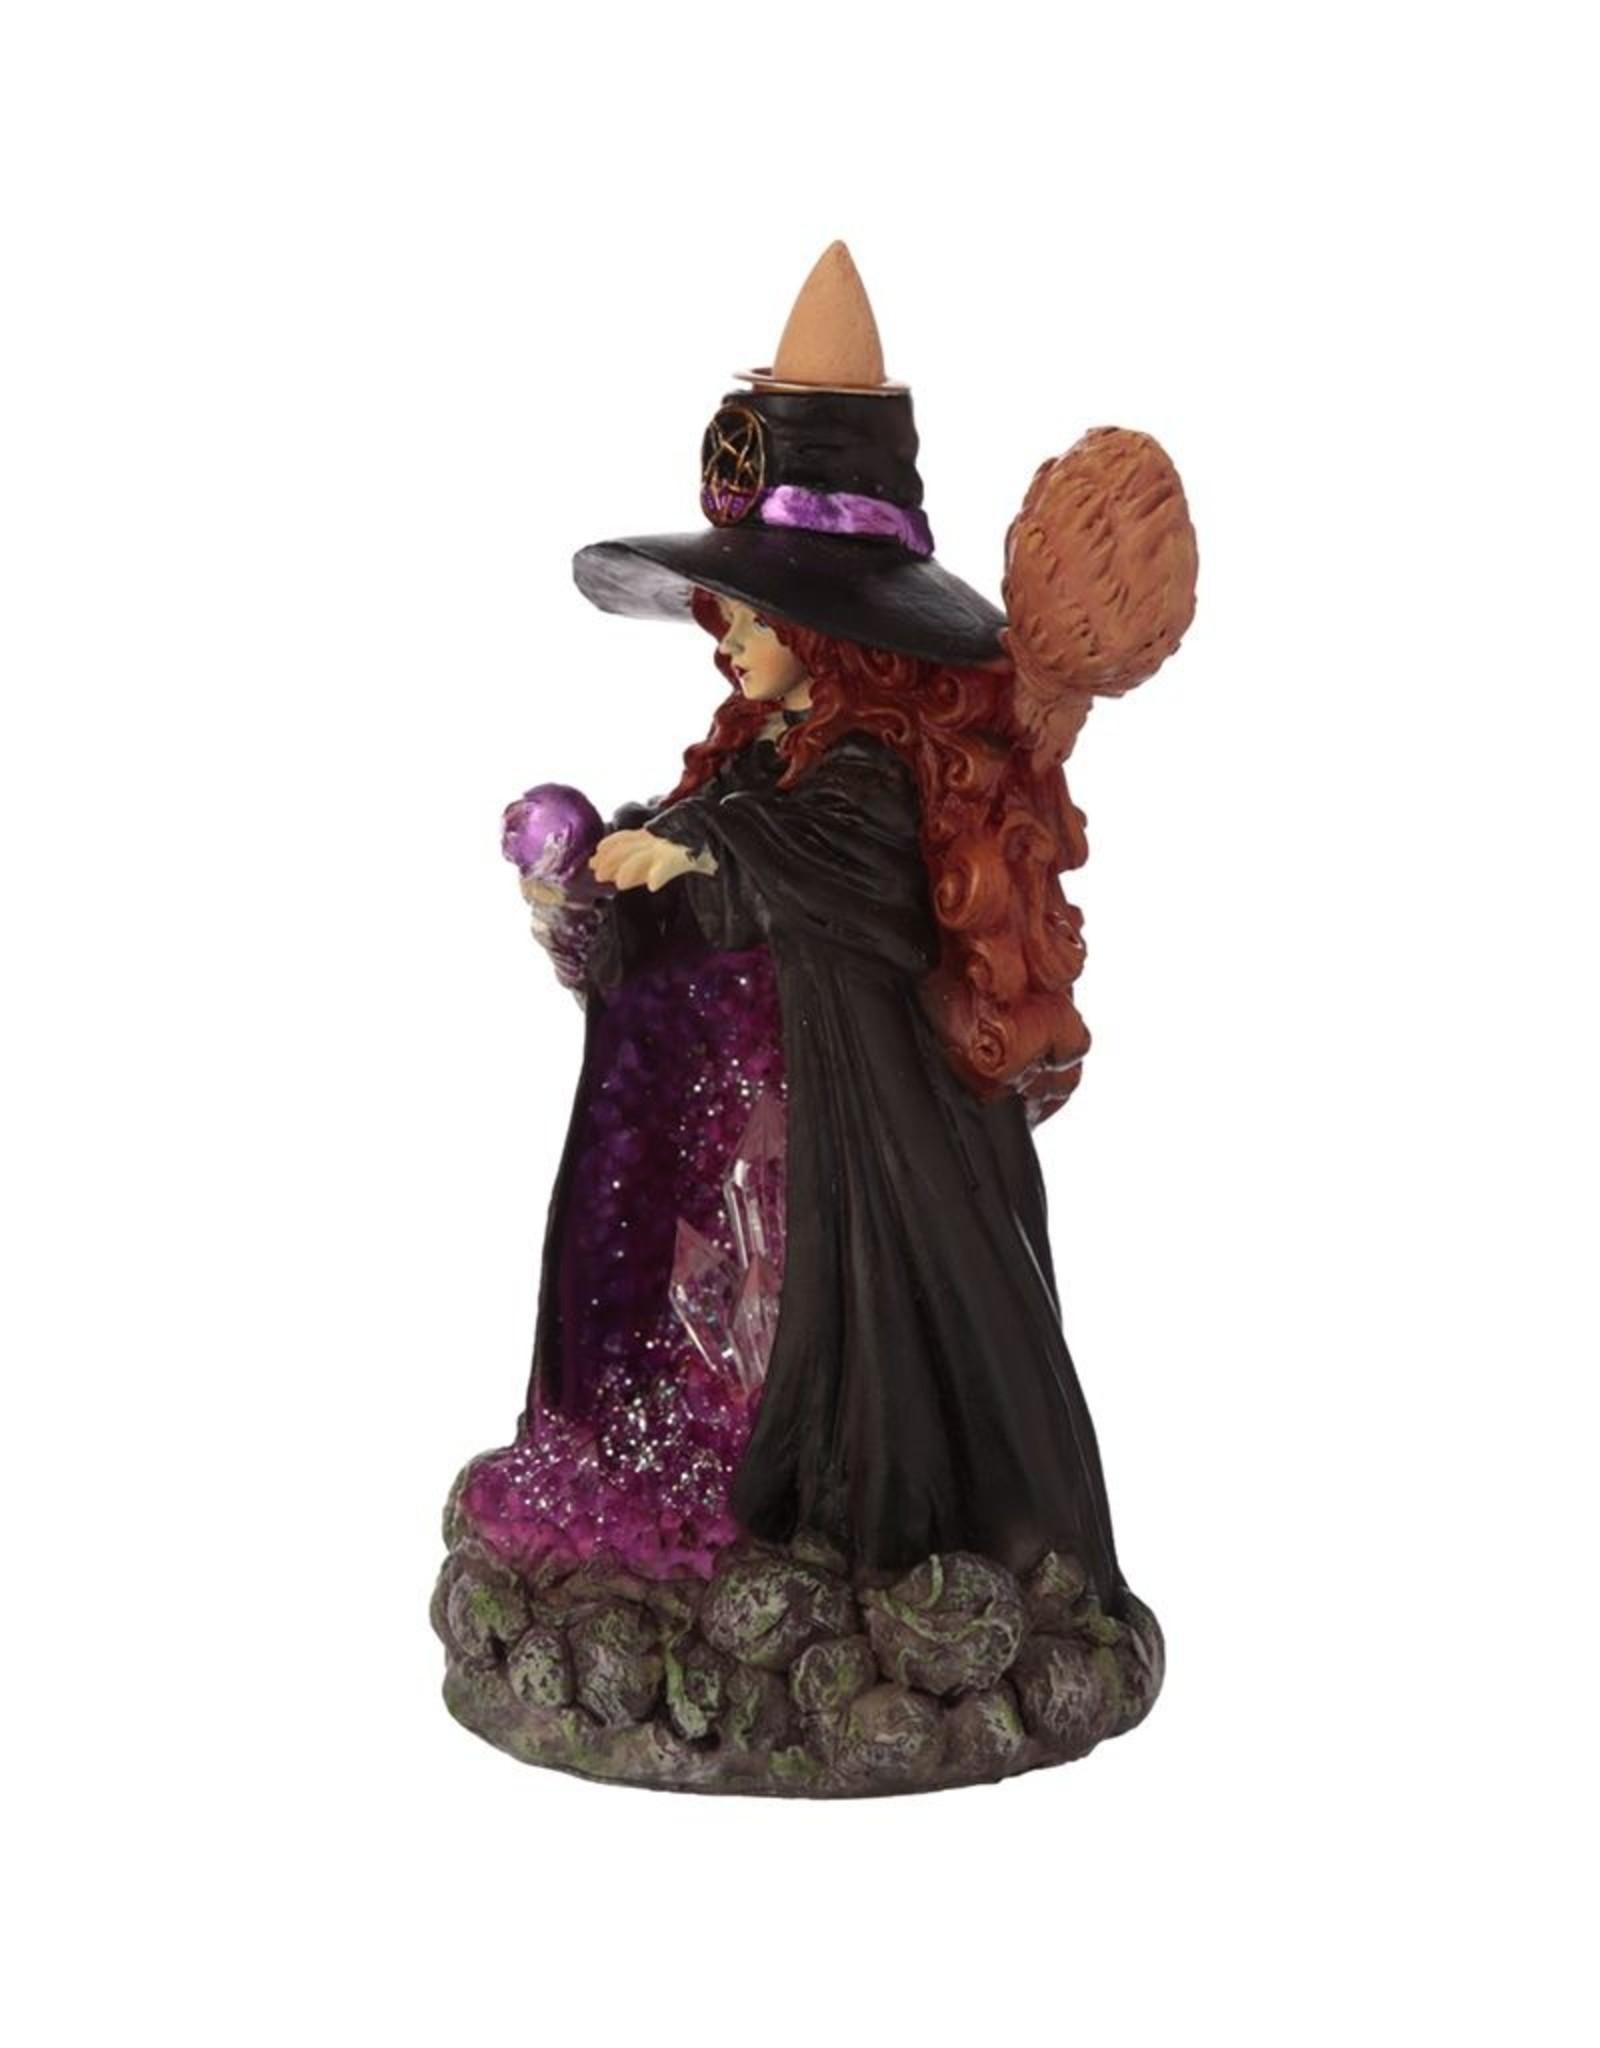 Witches cave Giftware Beelden Collectables  - Heksen Kristalgrot LED  Backflow Wierookhouder